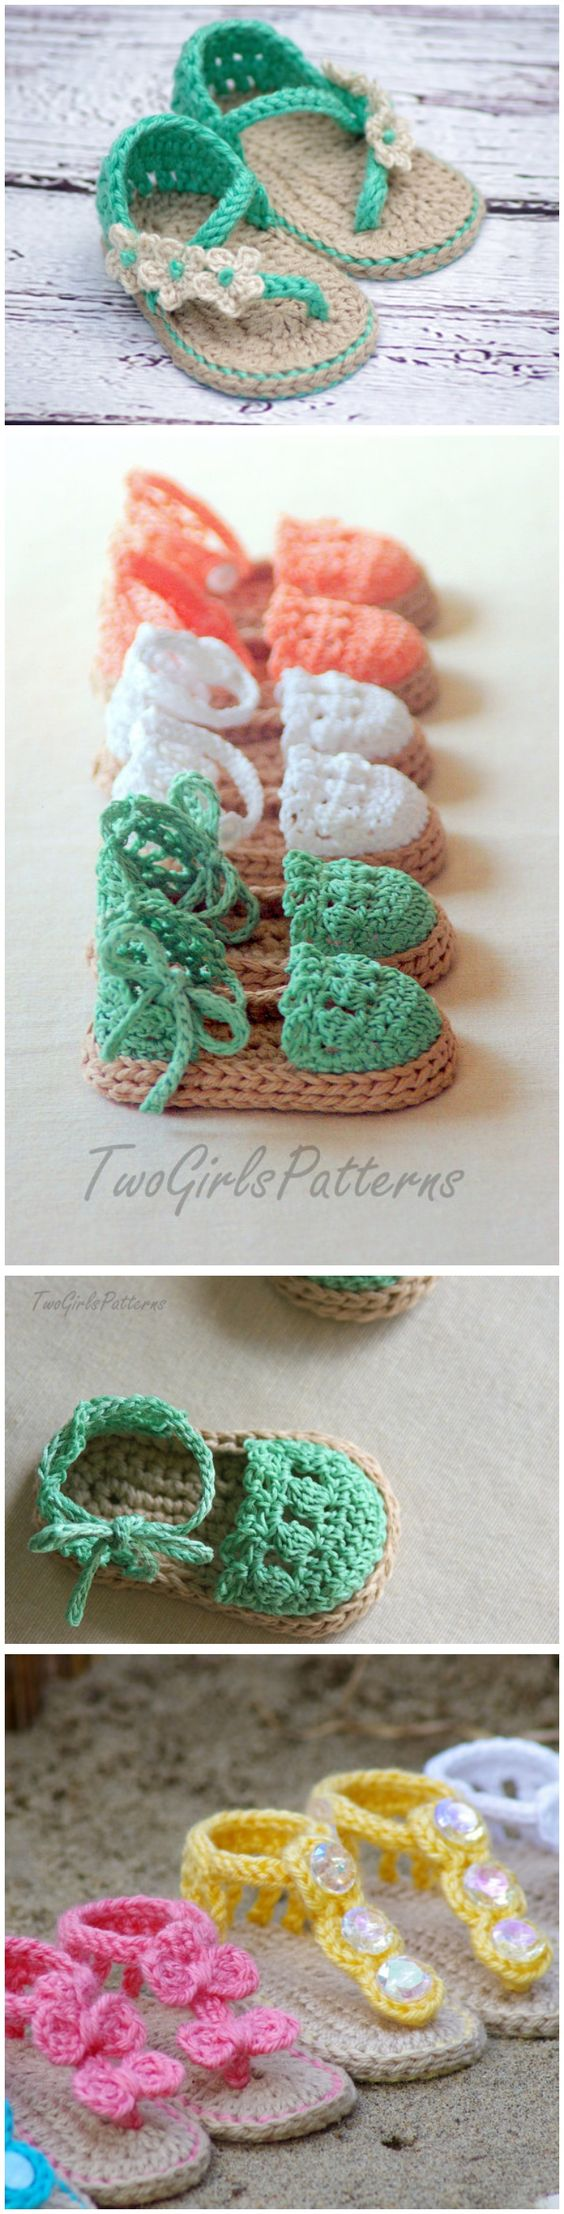 Baby Sandals Crochet Pattern                                                                                                                                                      More: